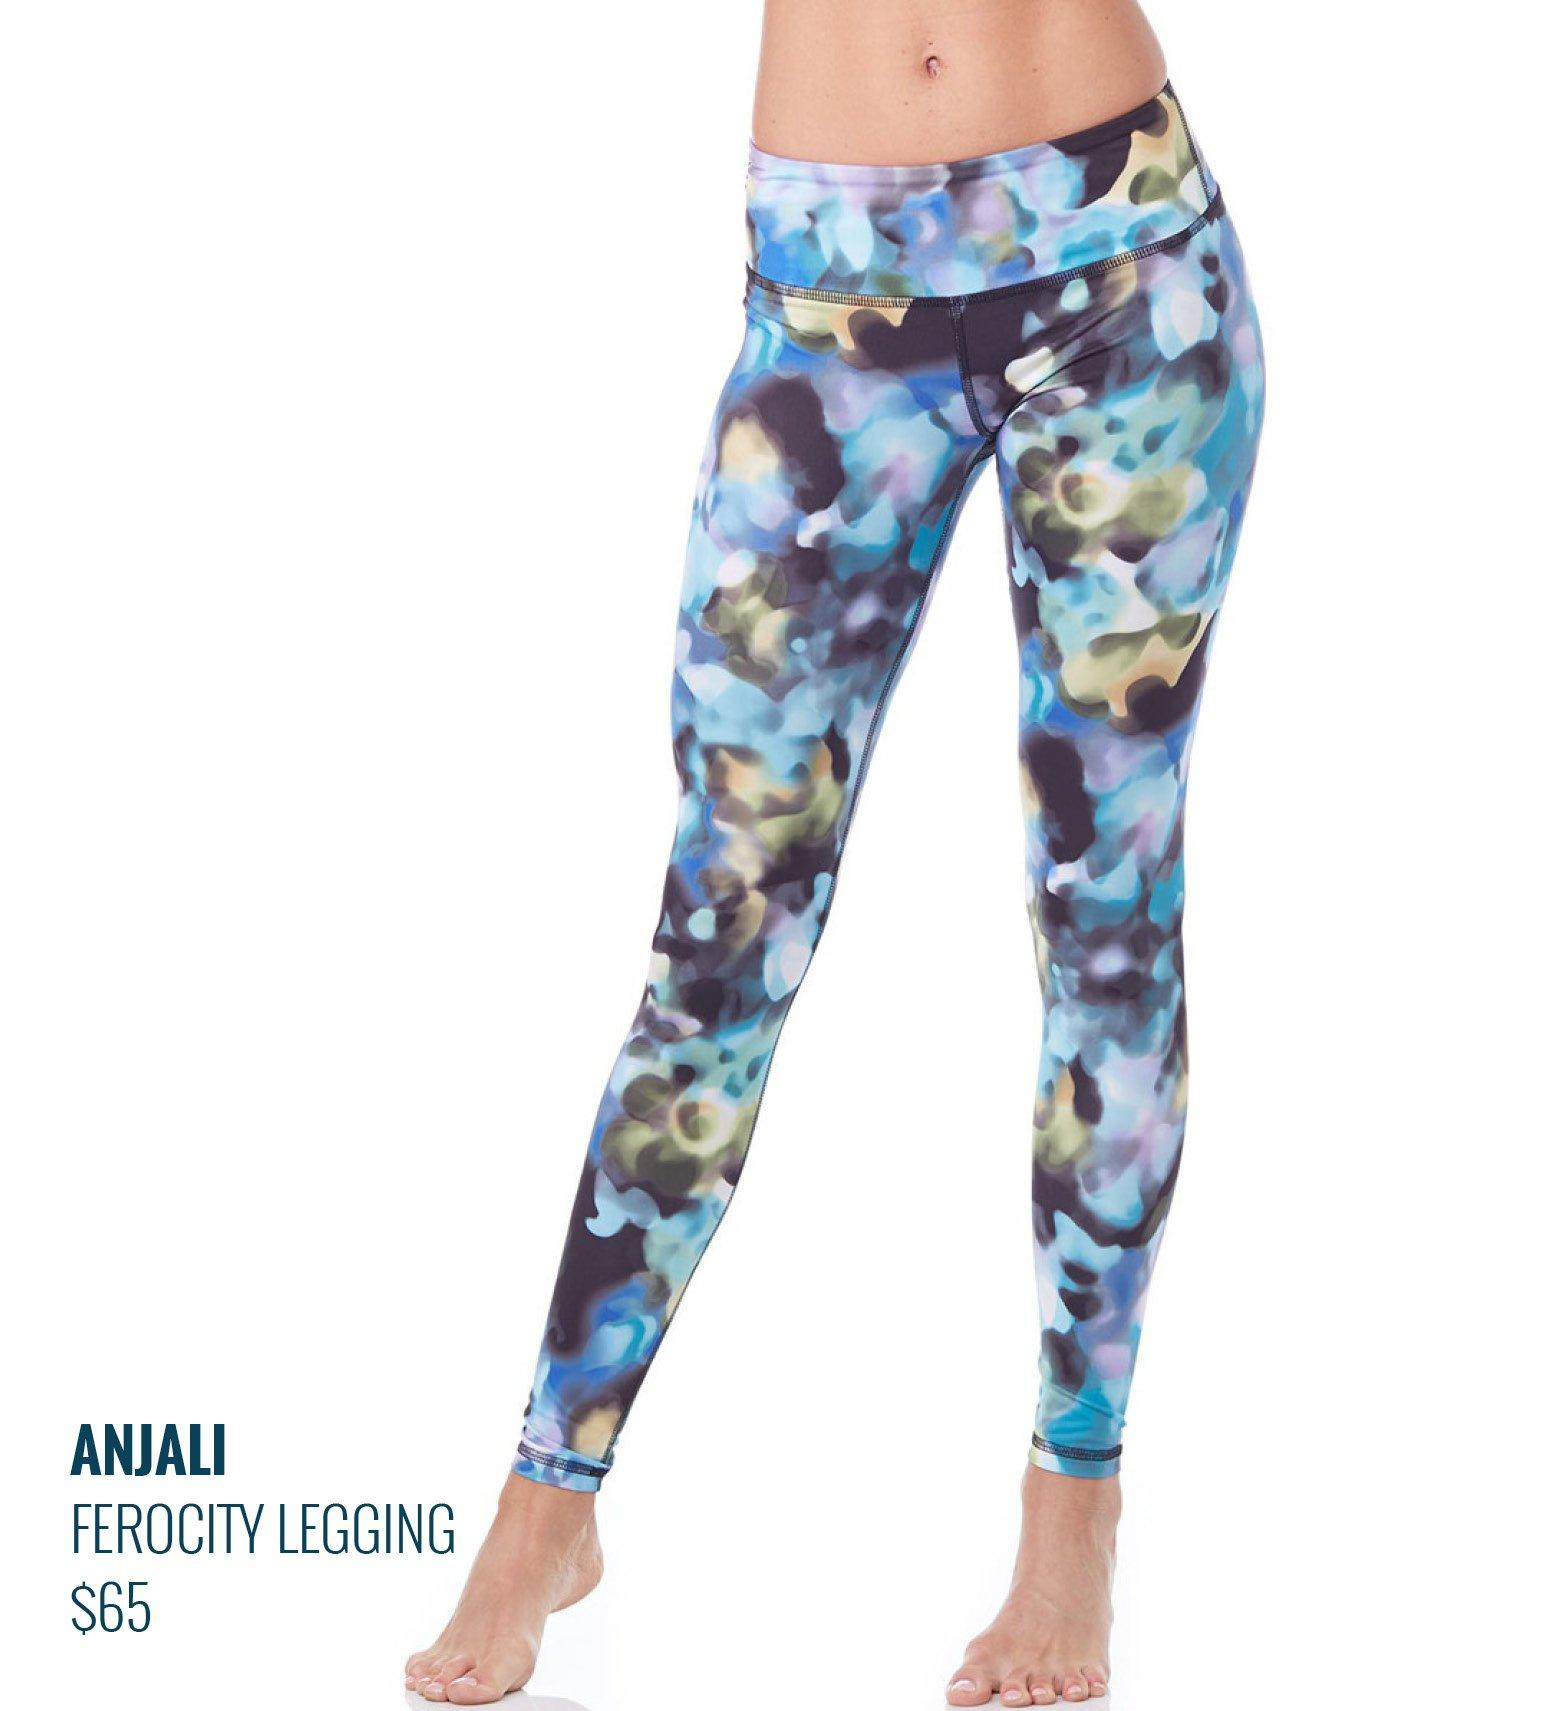 Anjali Ferocity Legging